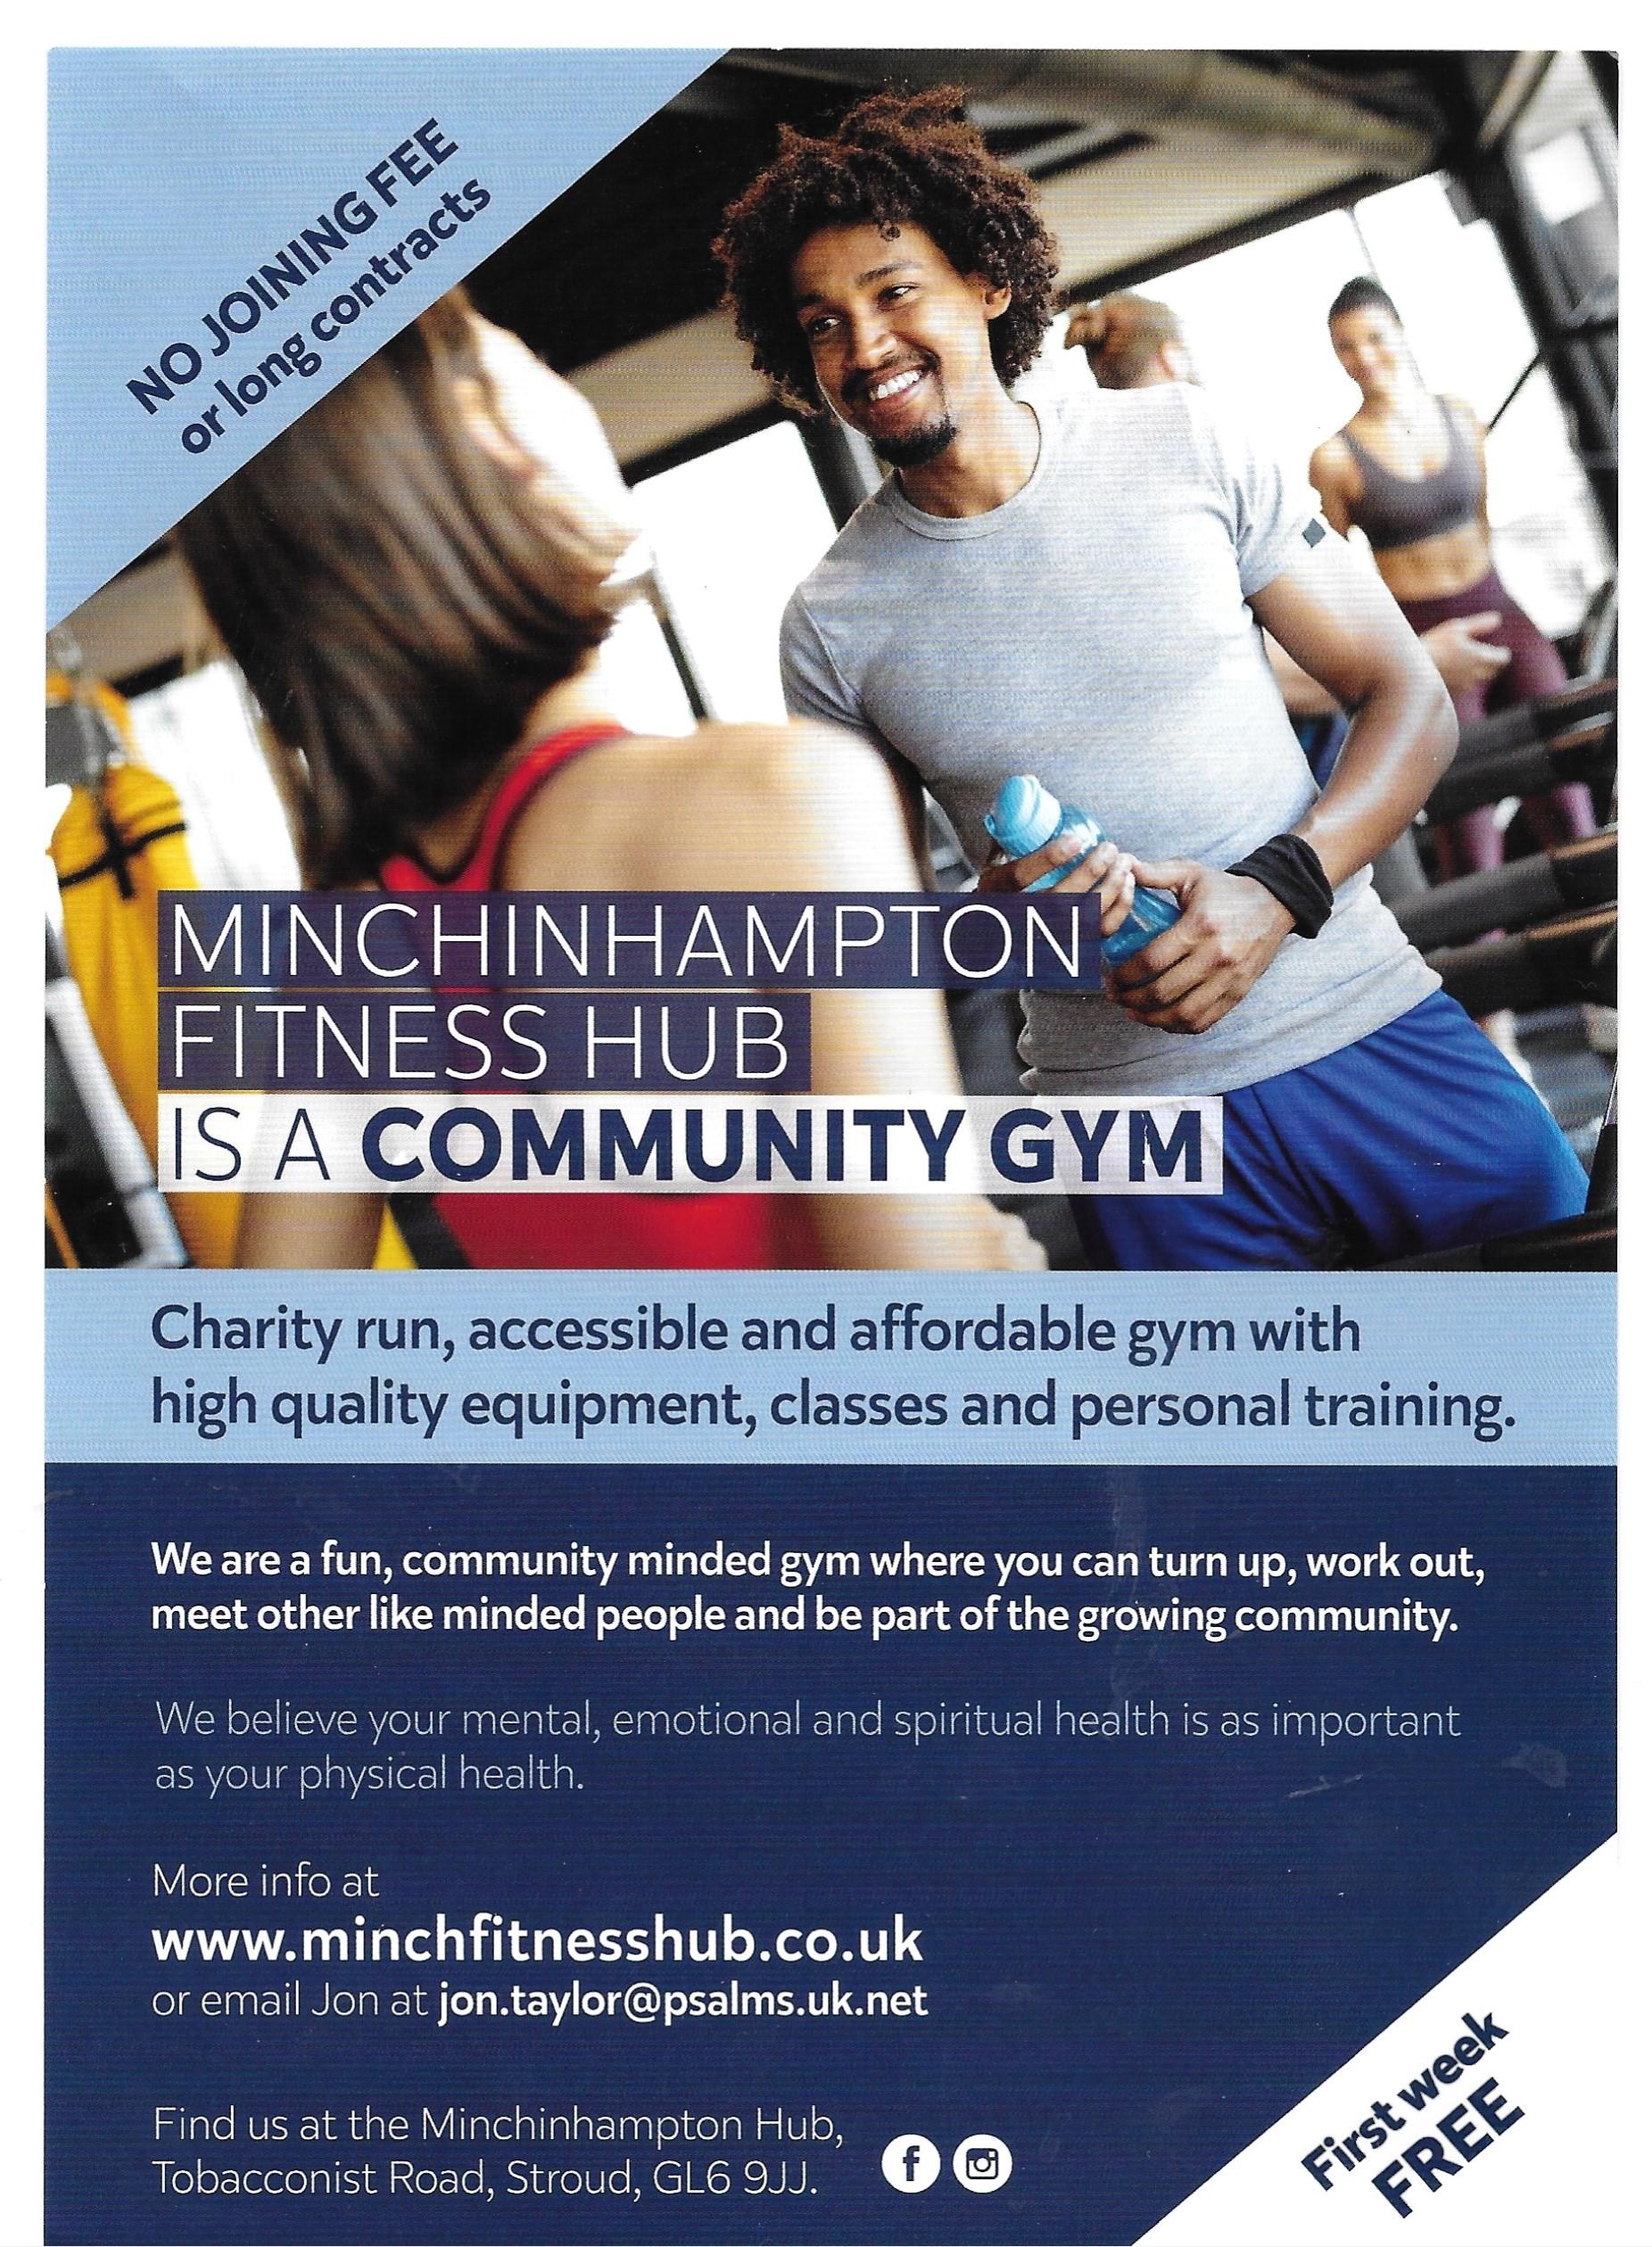 Minchinhampton Fitness Hub